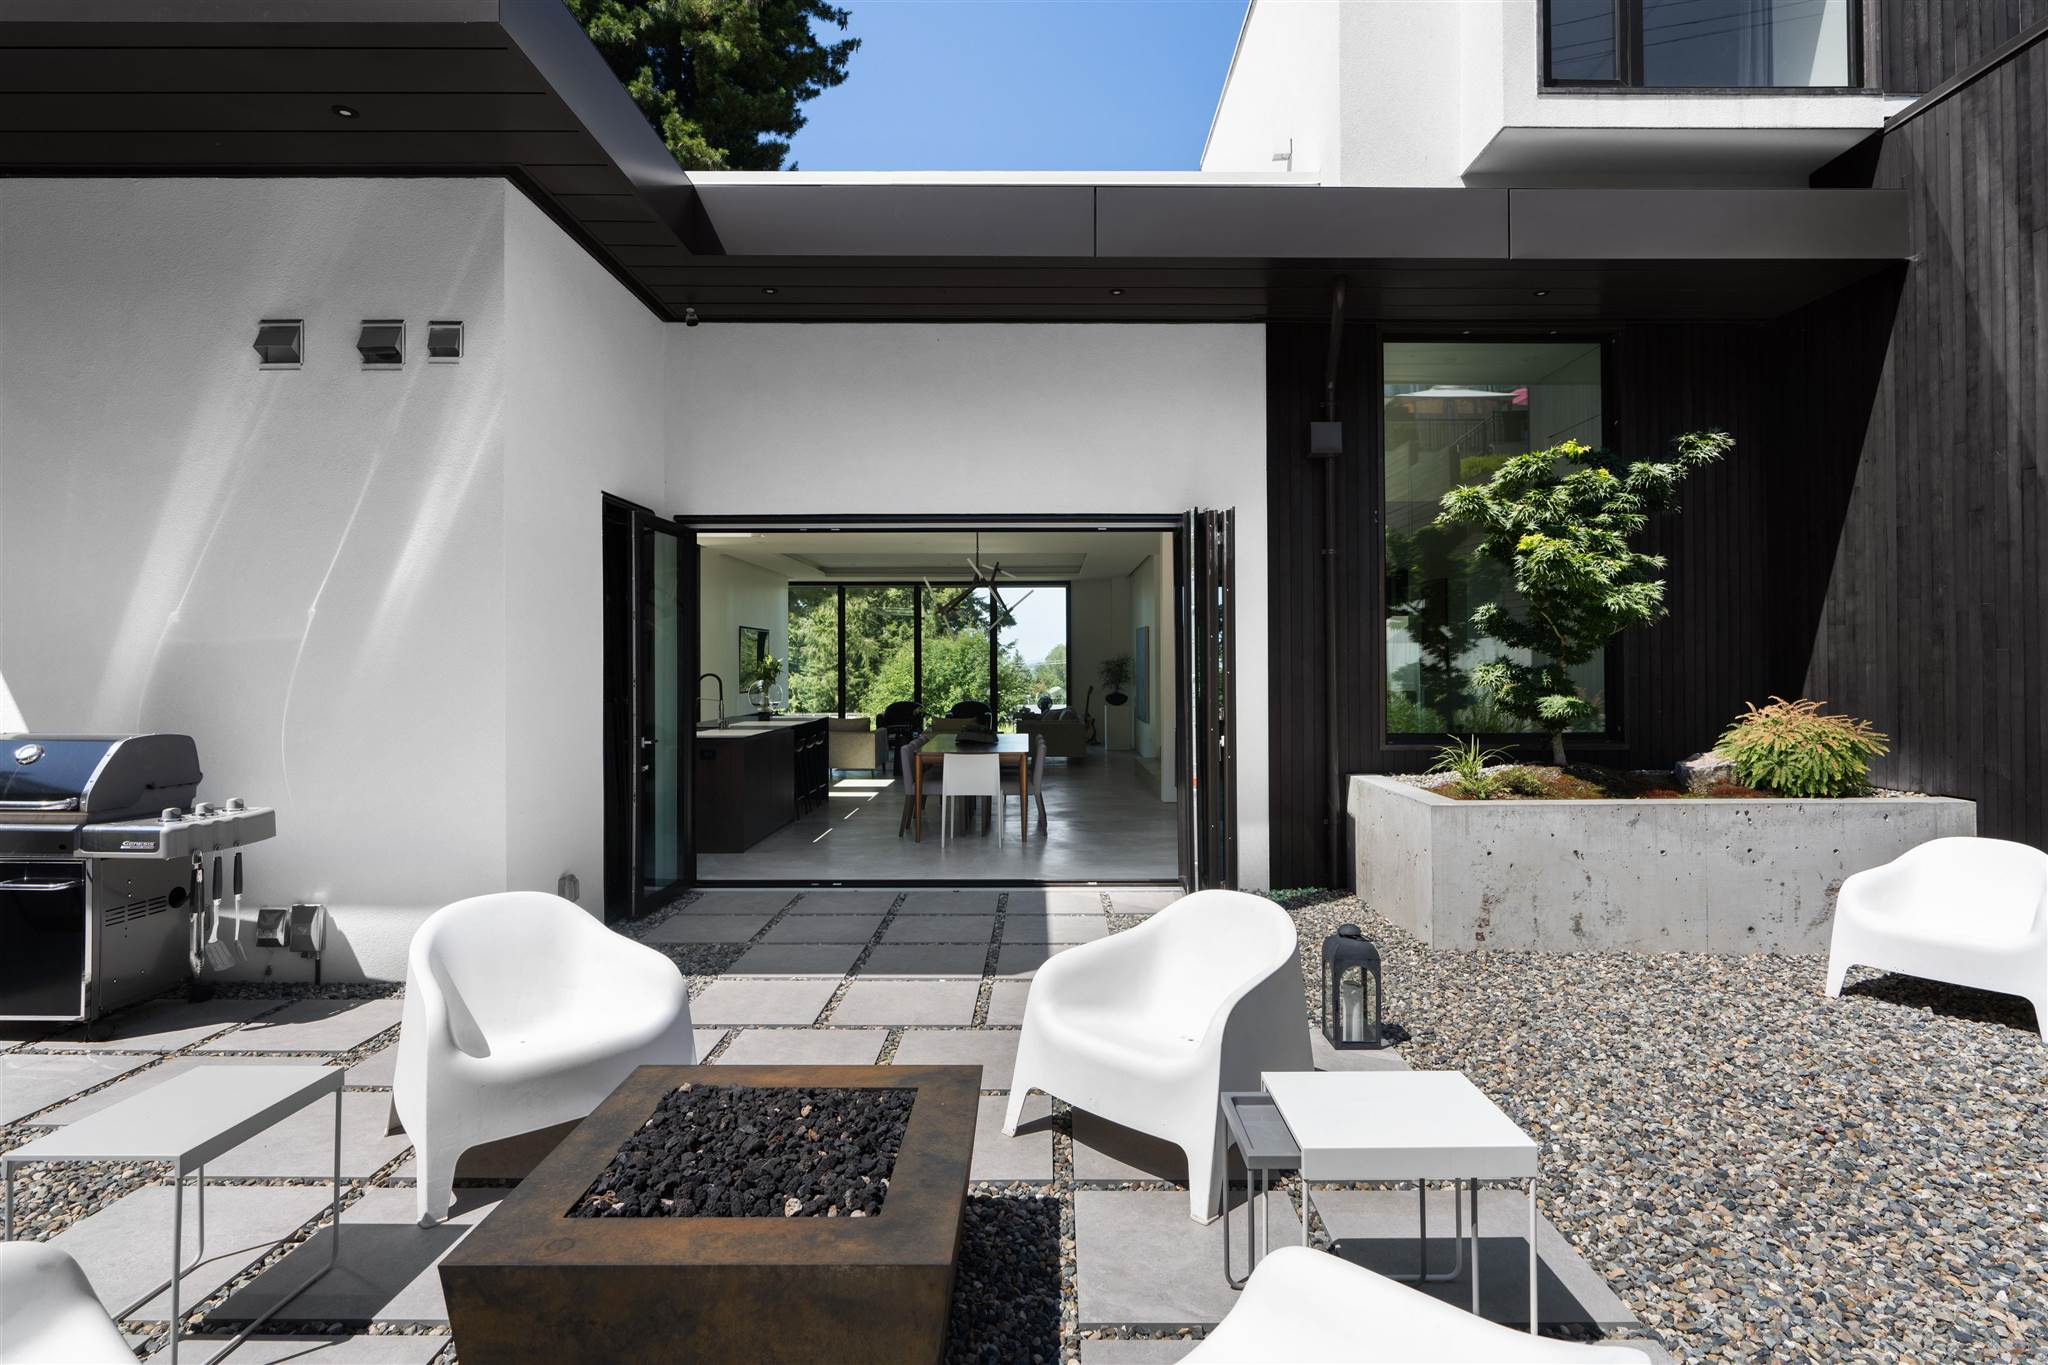 276 SANDRINGHAM CRESCENT - Upper Lonsdale House/Single Family for sale, 7 Bedrooms (R2617703) - #16